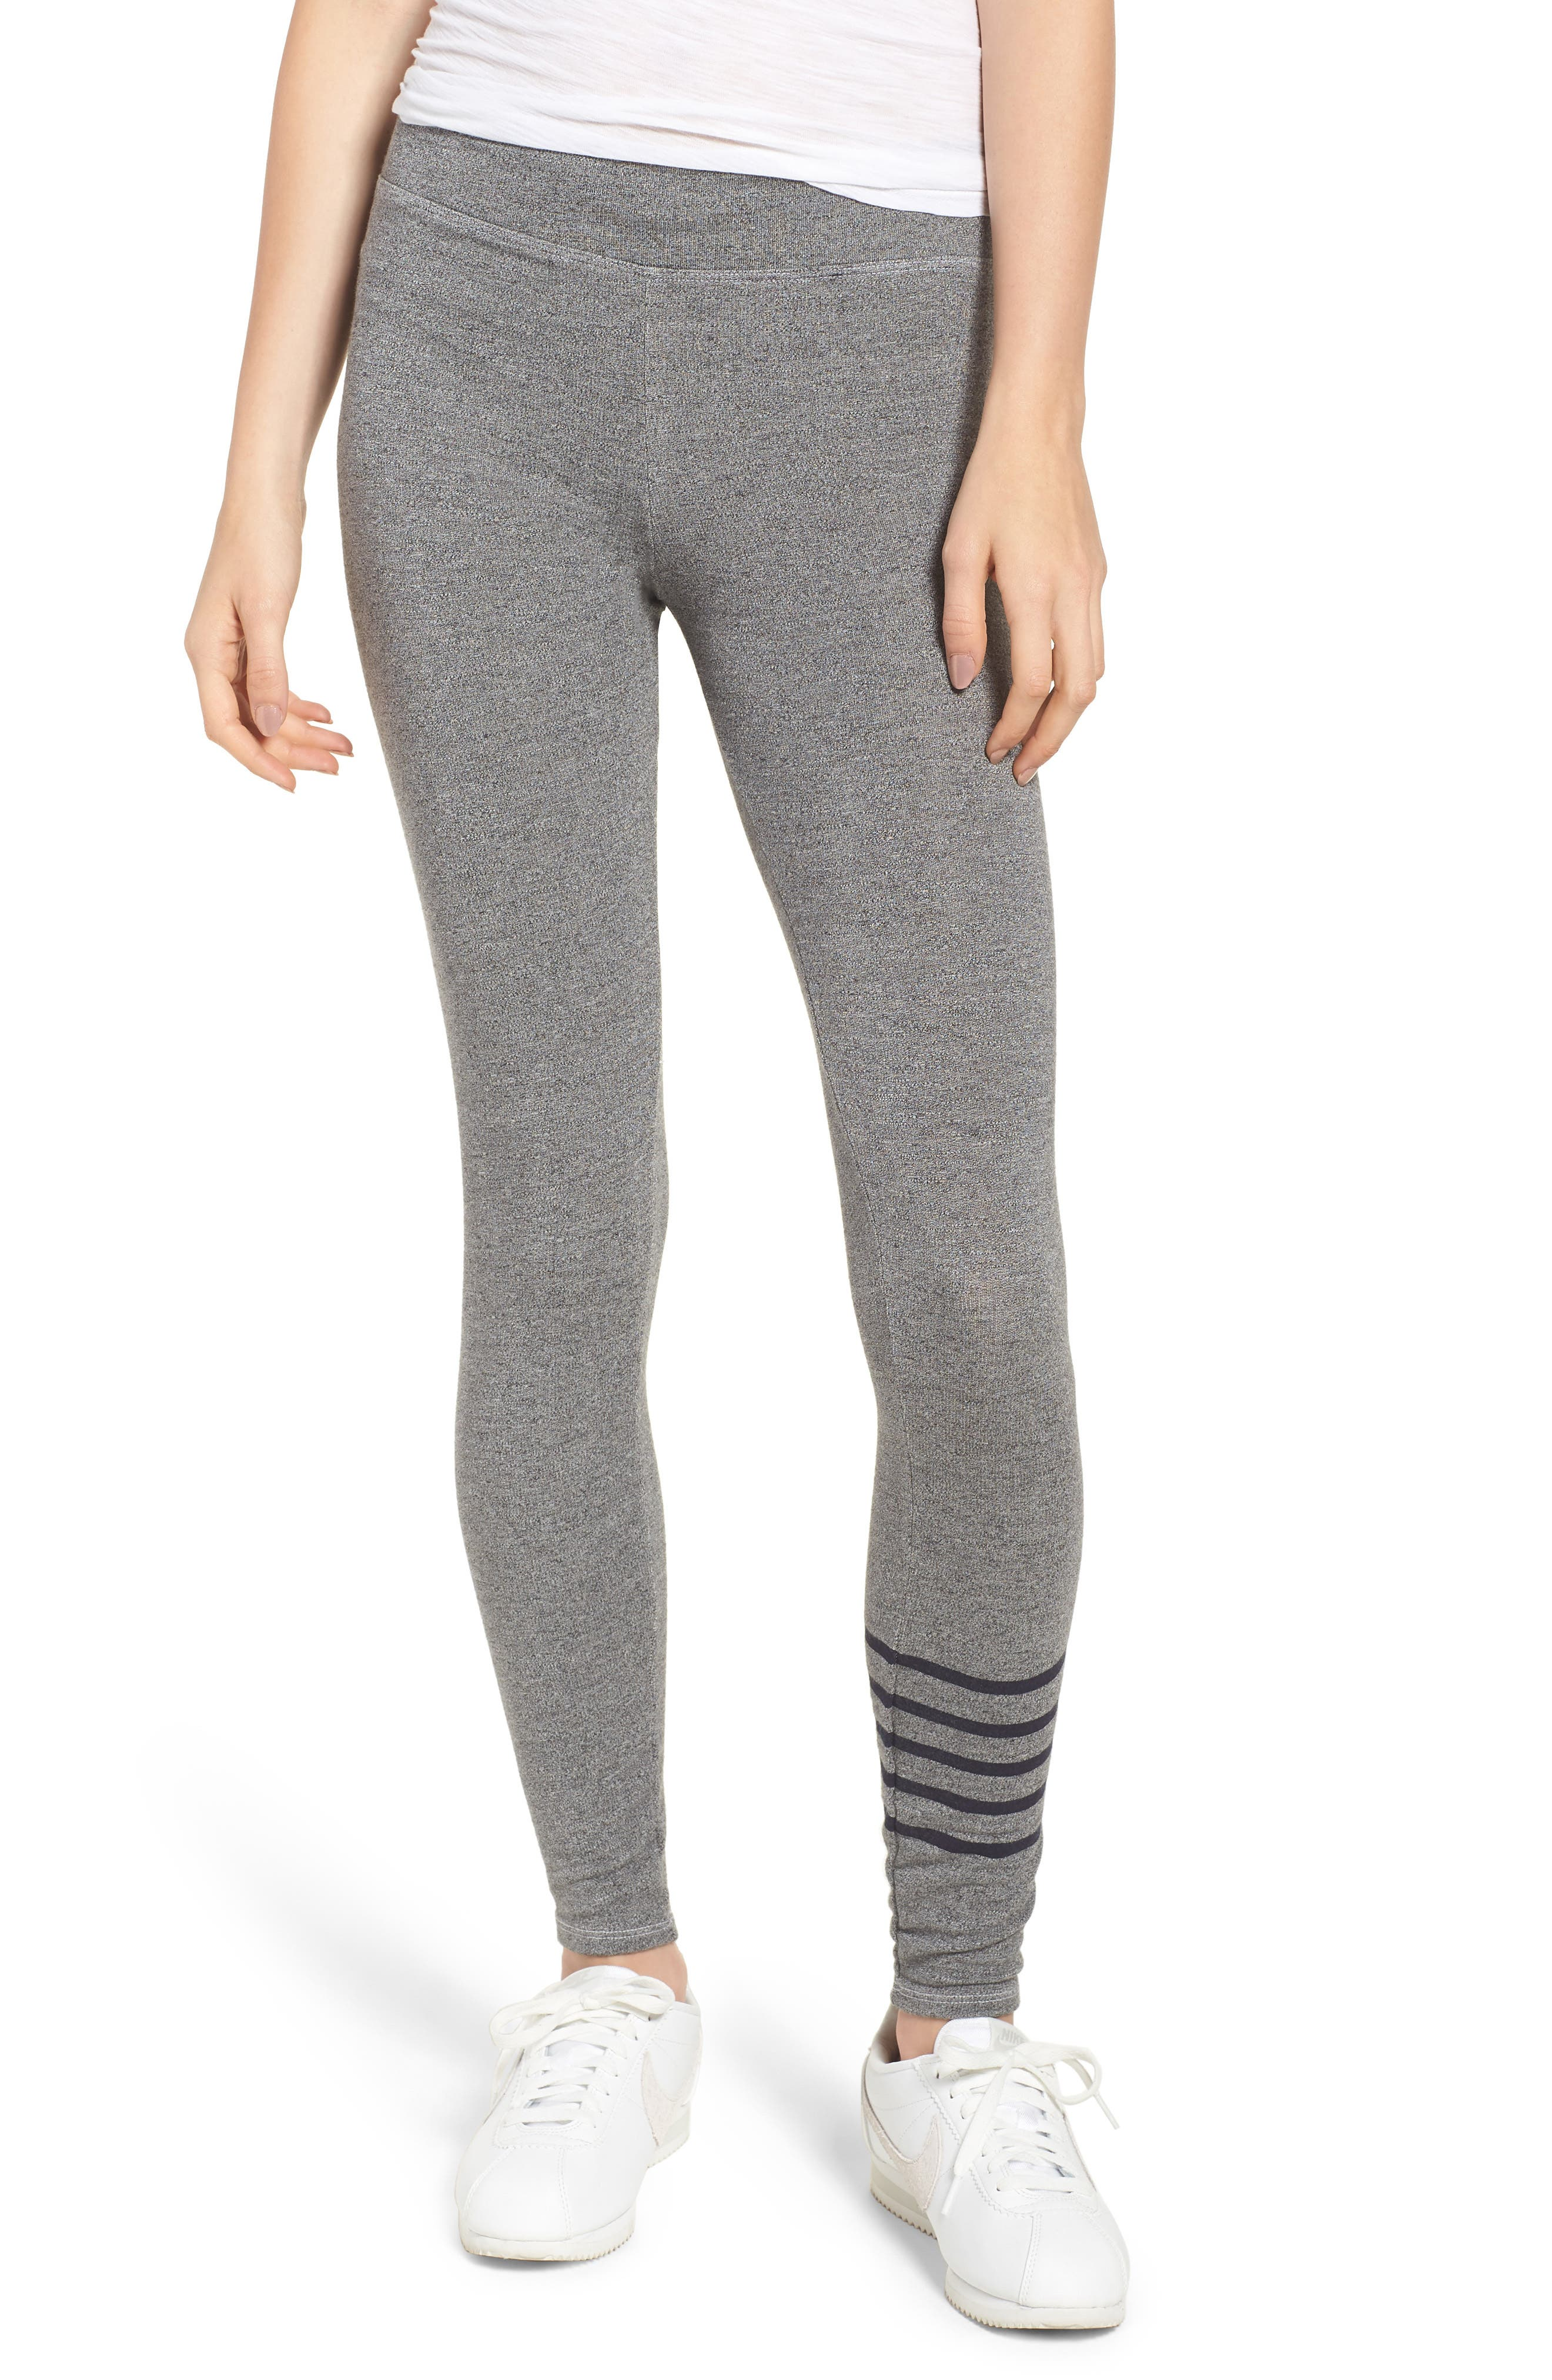 Stripe Yoga Pants,                         Main,                         color, Heather Grey